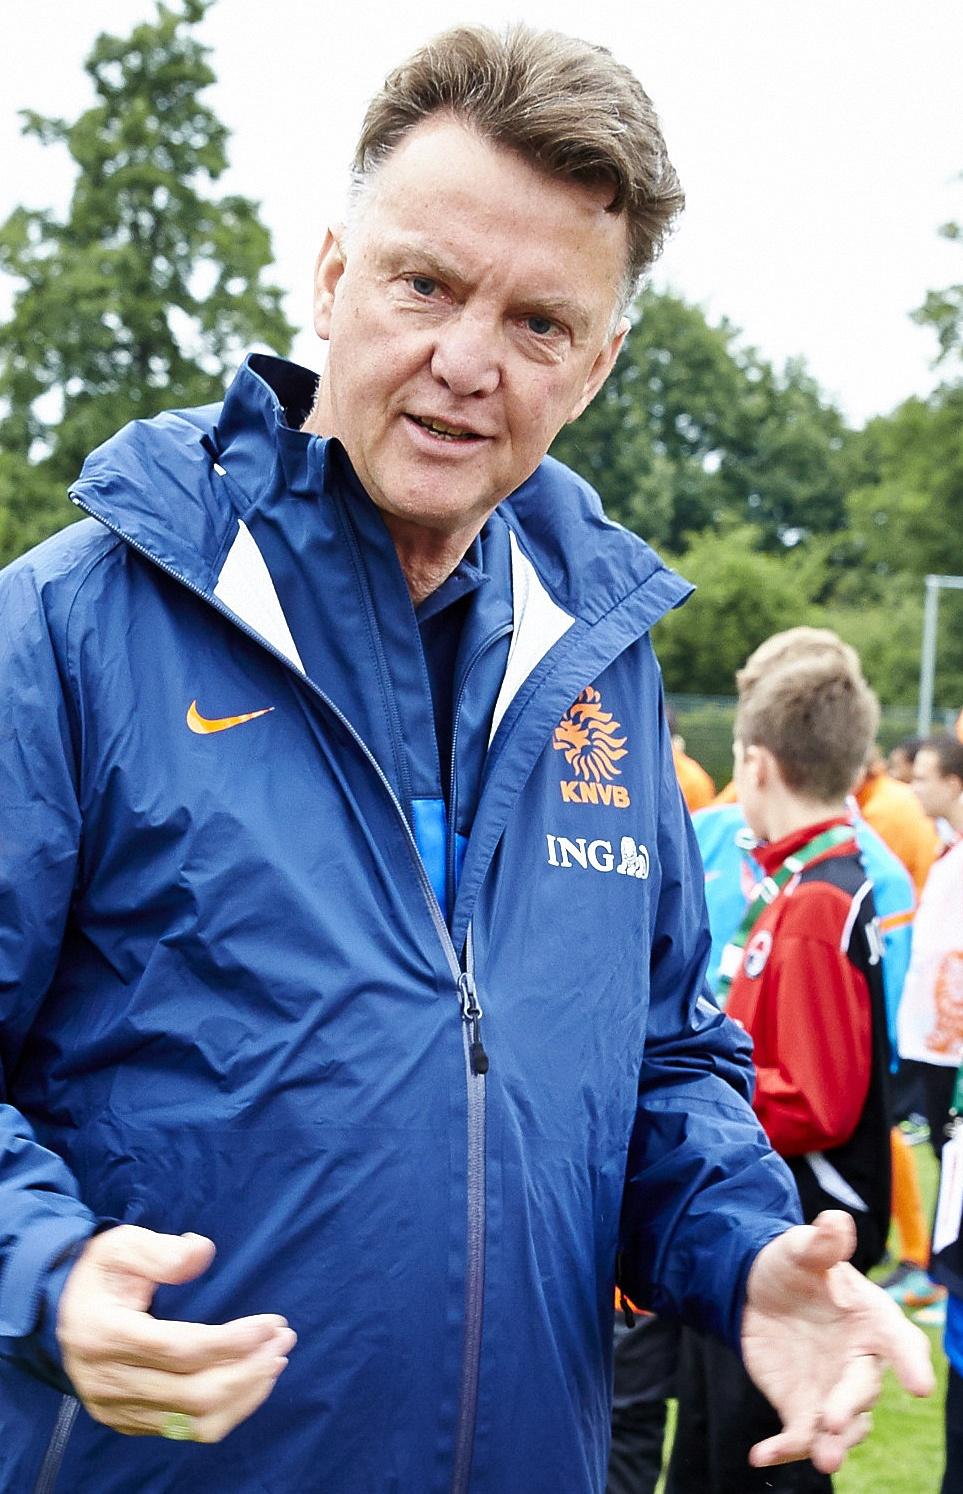 Mijlocaş şi antrenor olandez